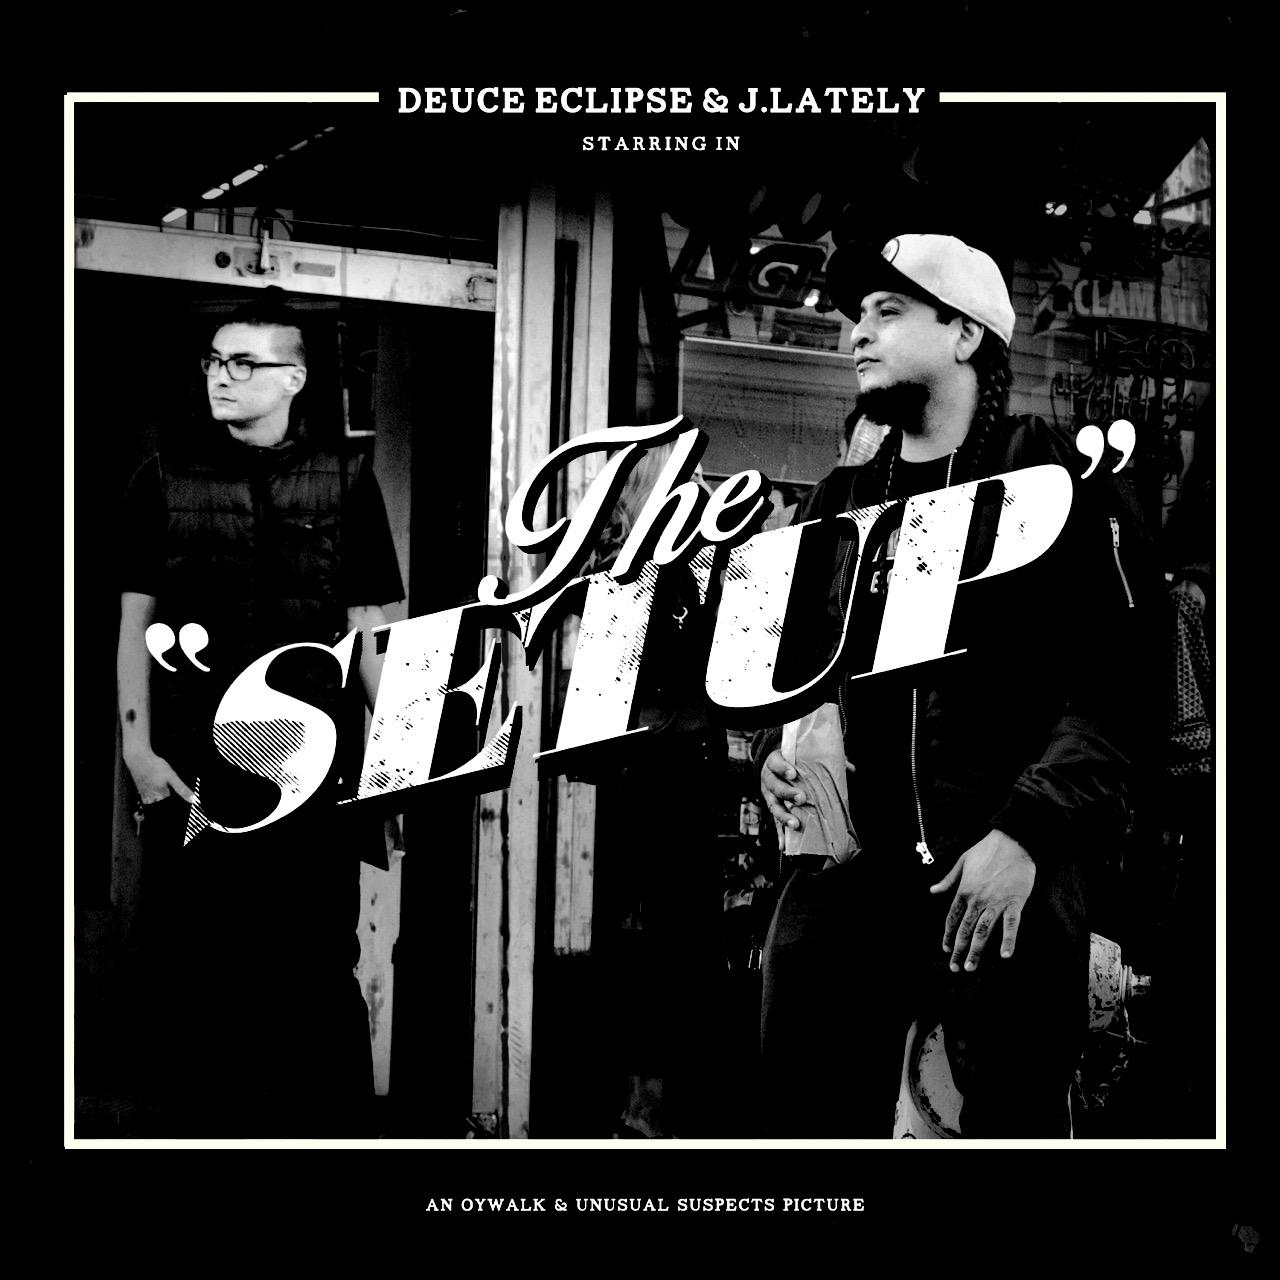 Deuce Eclipse & J.Lately - The Setup [album] (ft. Zion I)